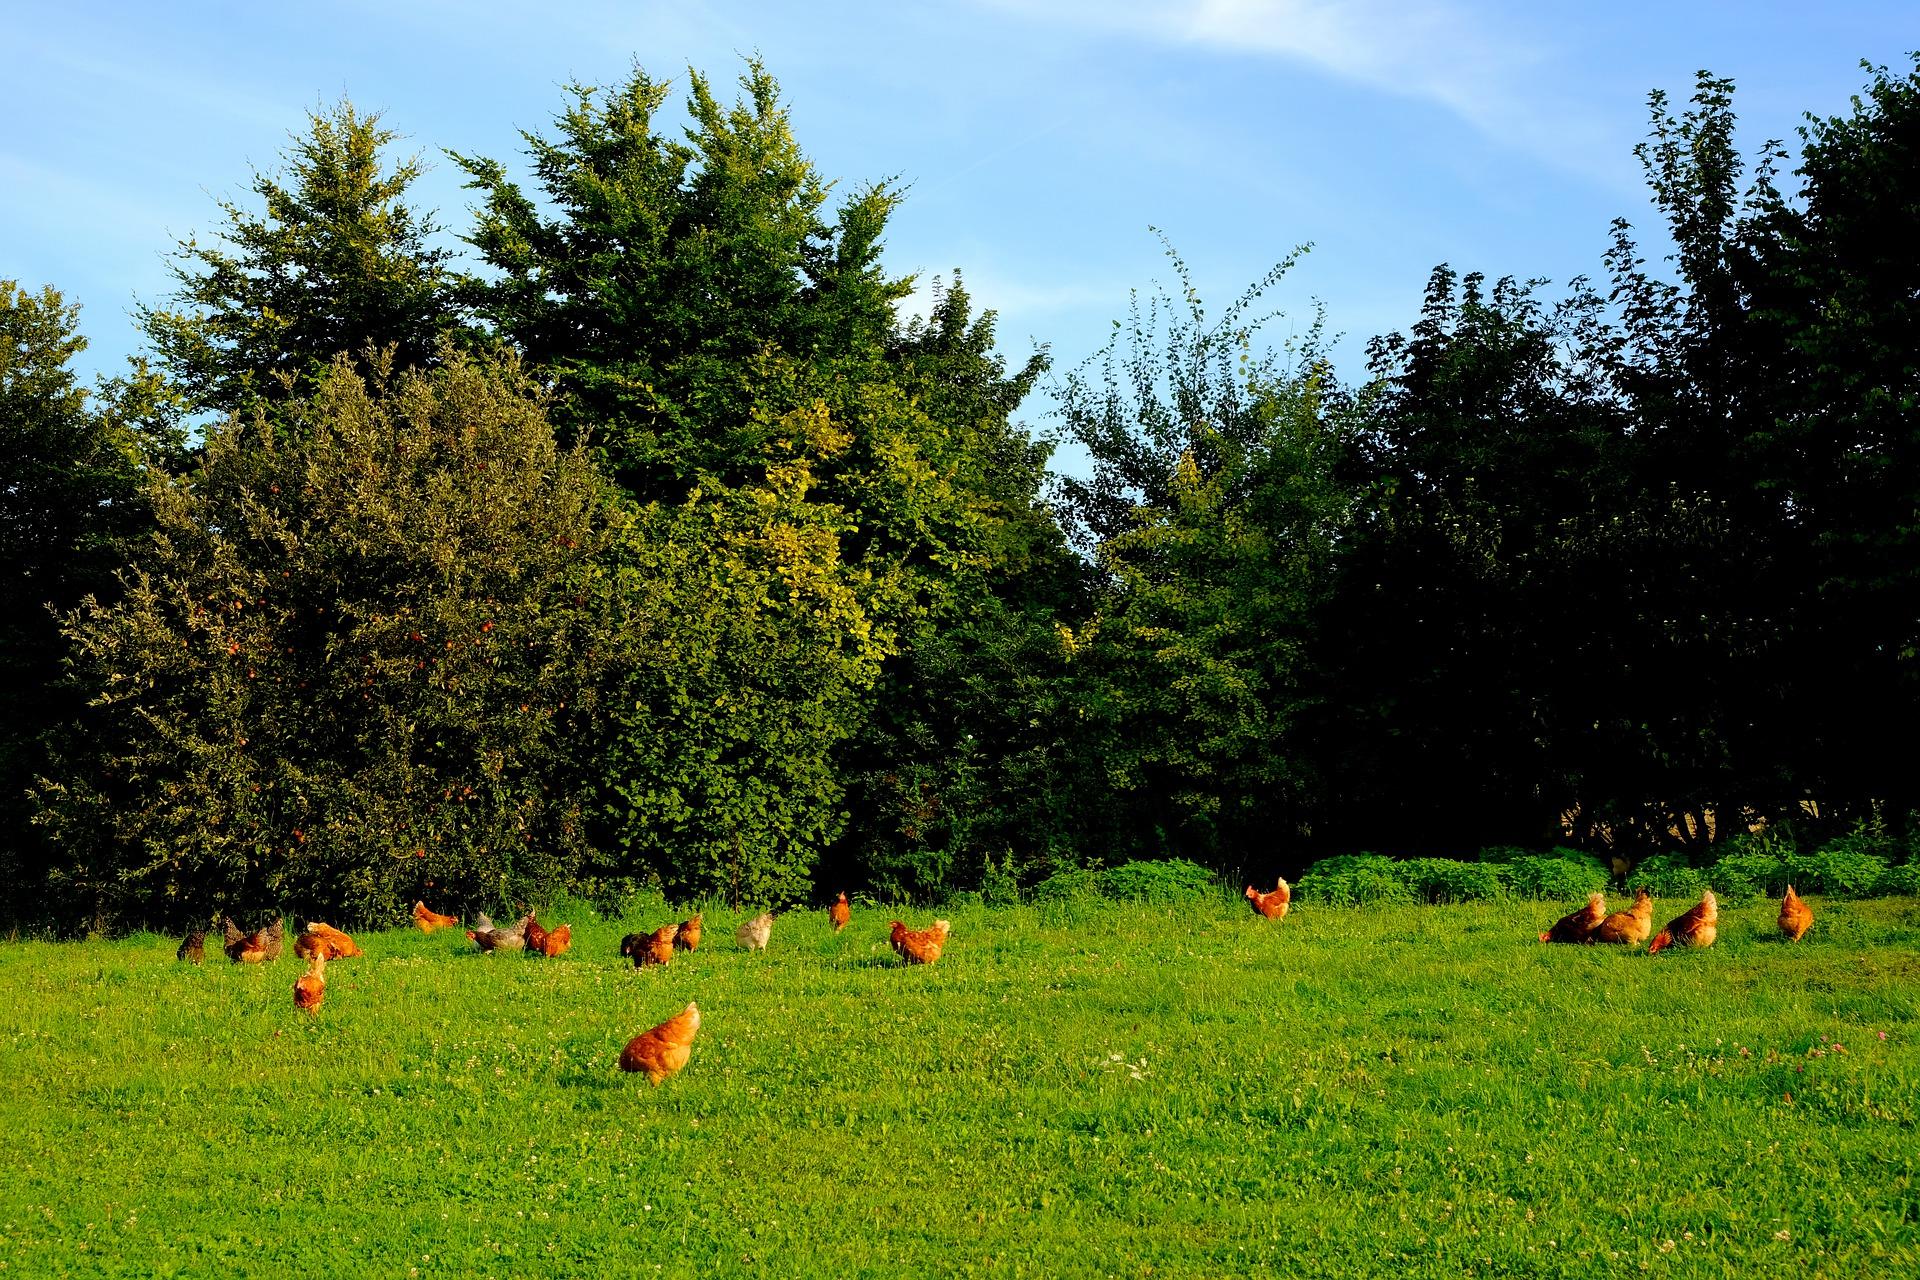 Brown chicken grazing free in a grass field